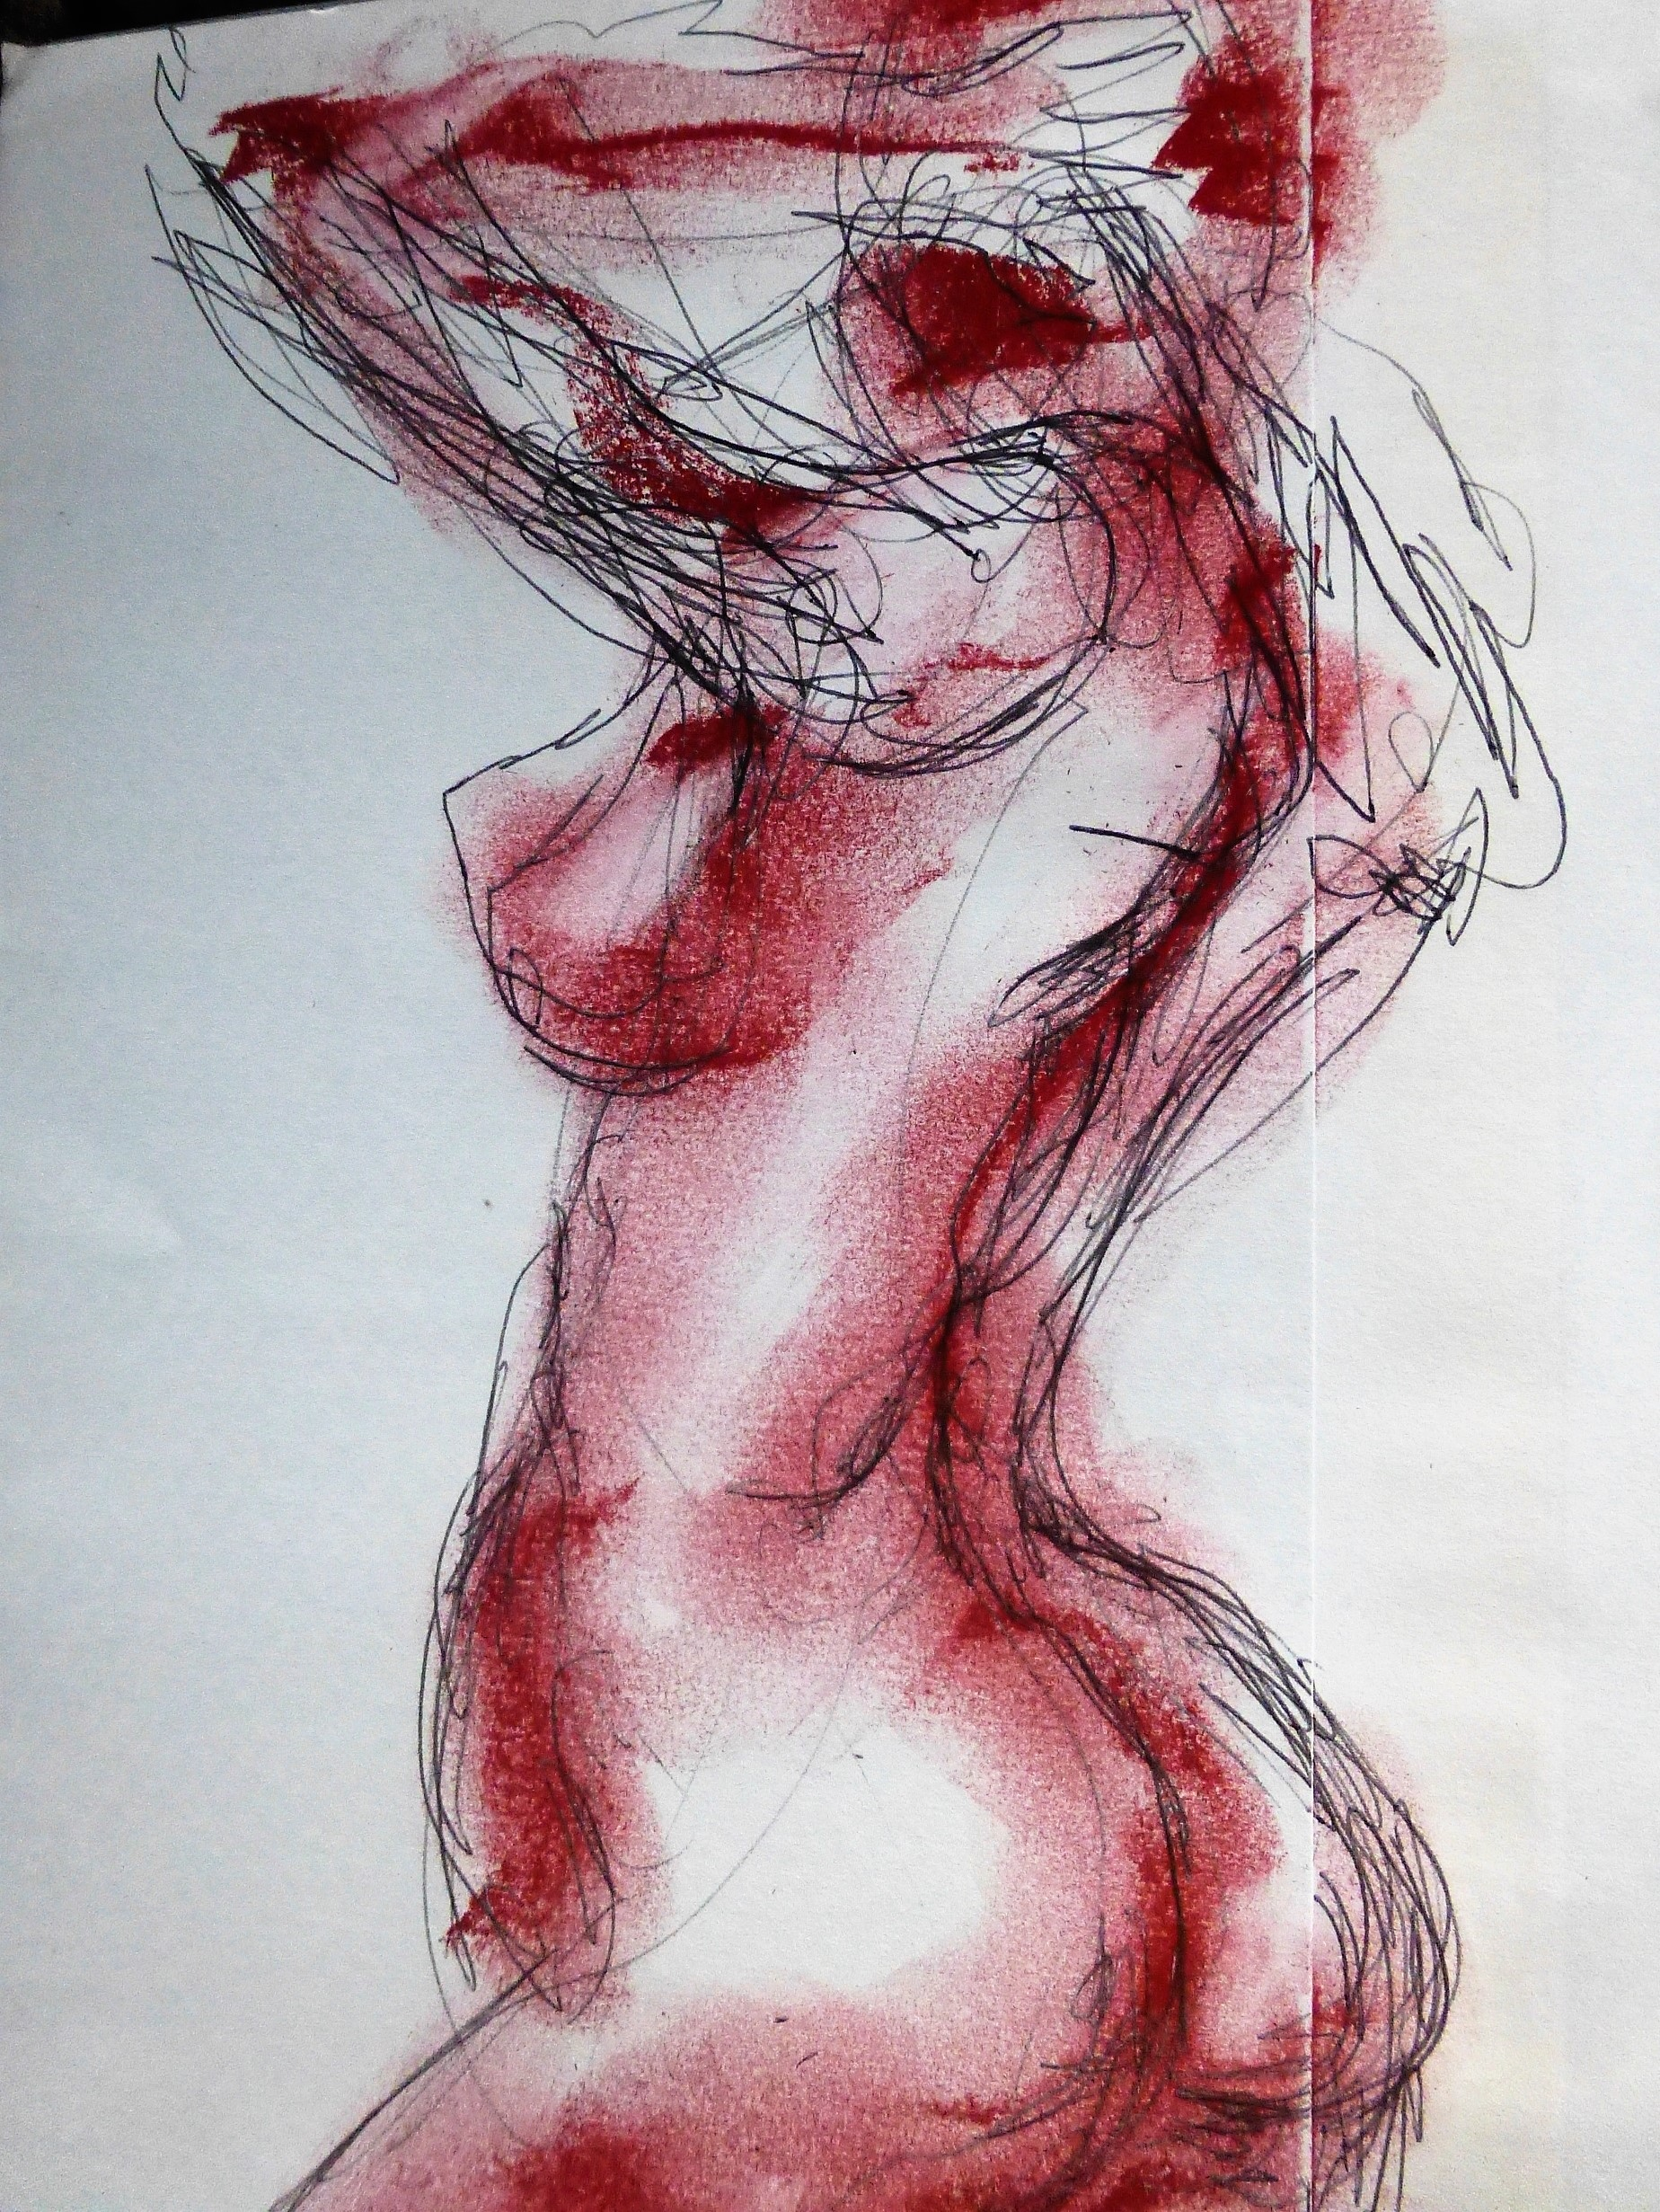 dessin de fesse par vladimir mitz